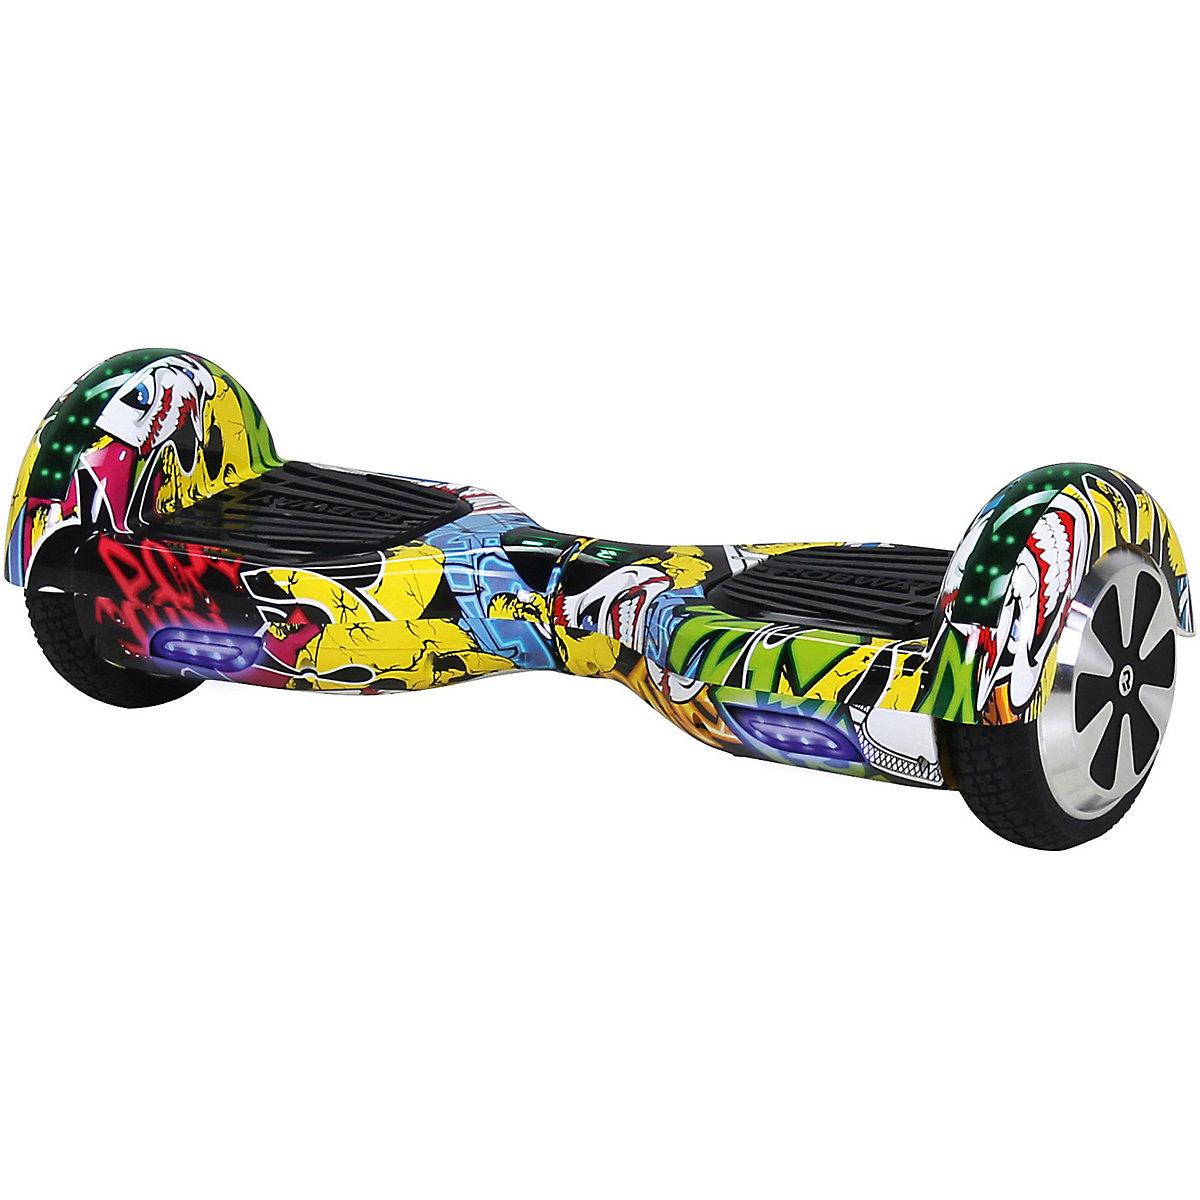 e balance hoverboard robway w1 6 5 zoll mit app funktion grafit gelb mytoys. Black Bedroom Furniture Sets. Home Design Ideas